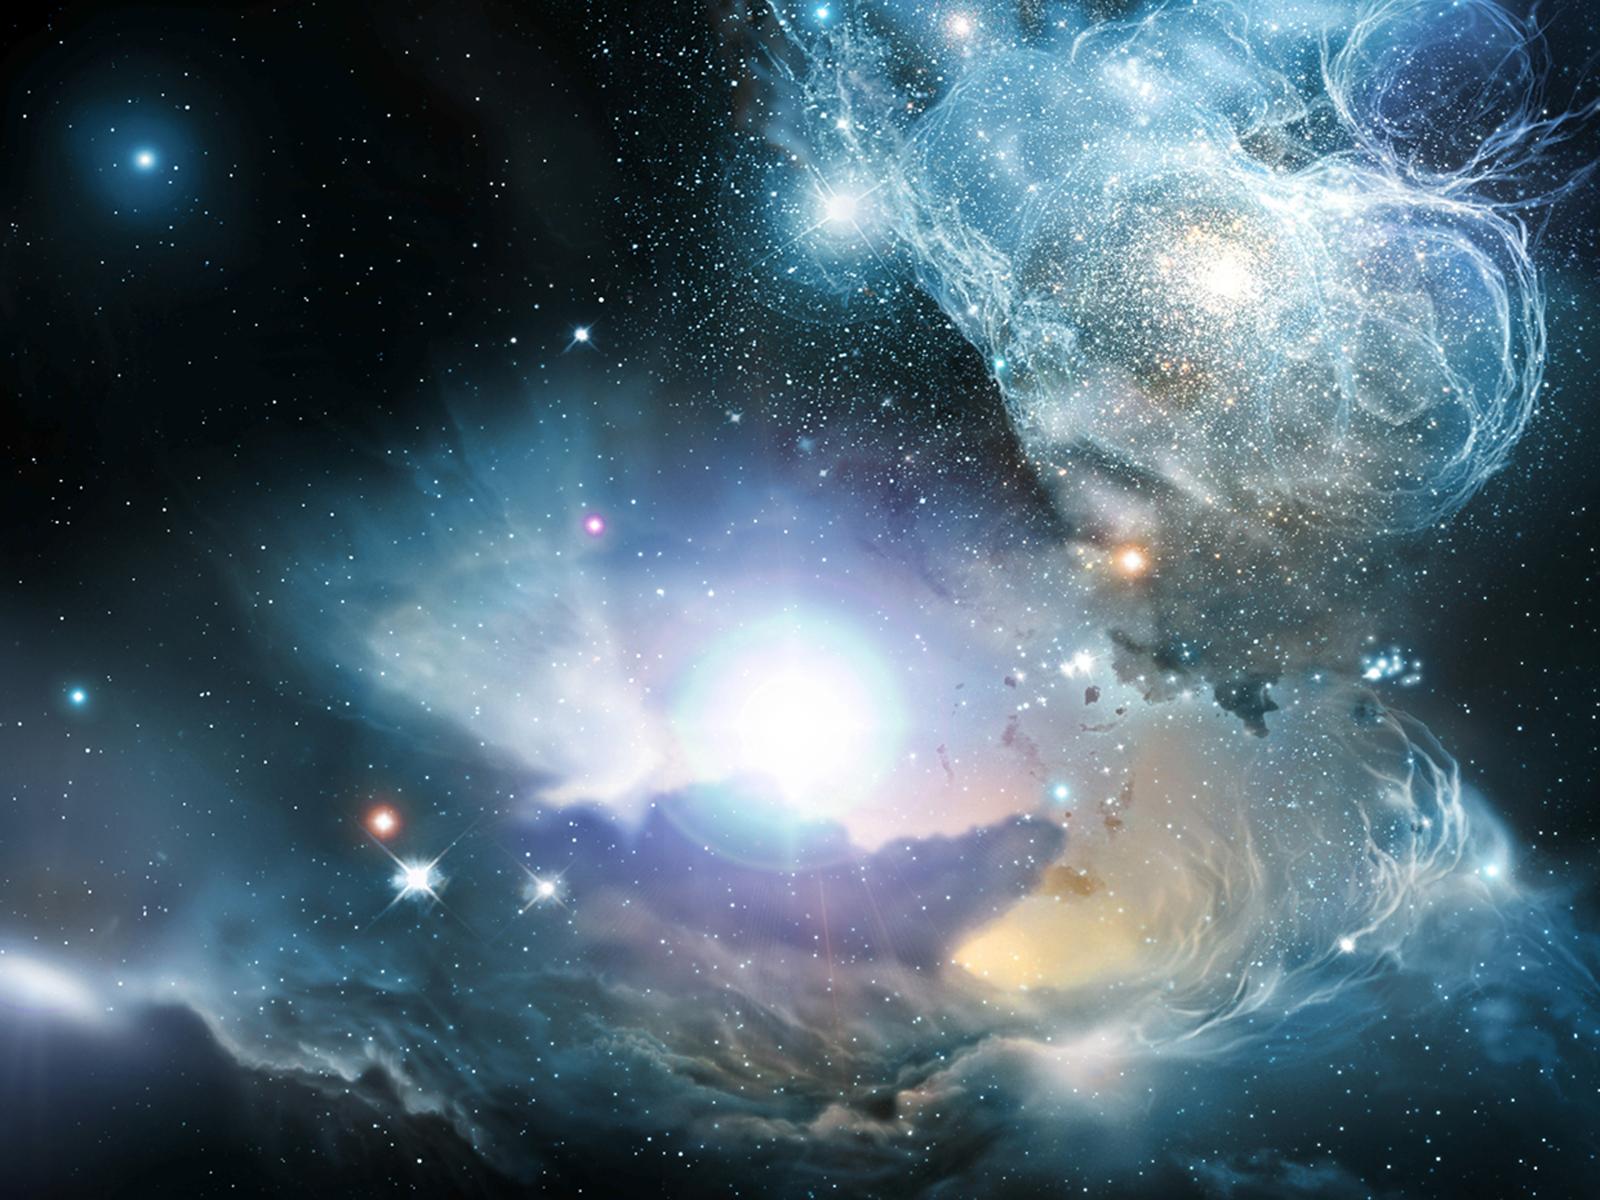 Digital Universe 53   Space Photography Desktop Wallpapers 4818 1600x1200